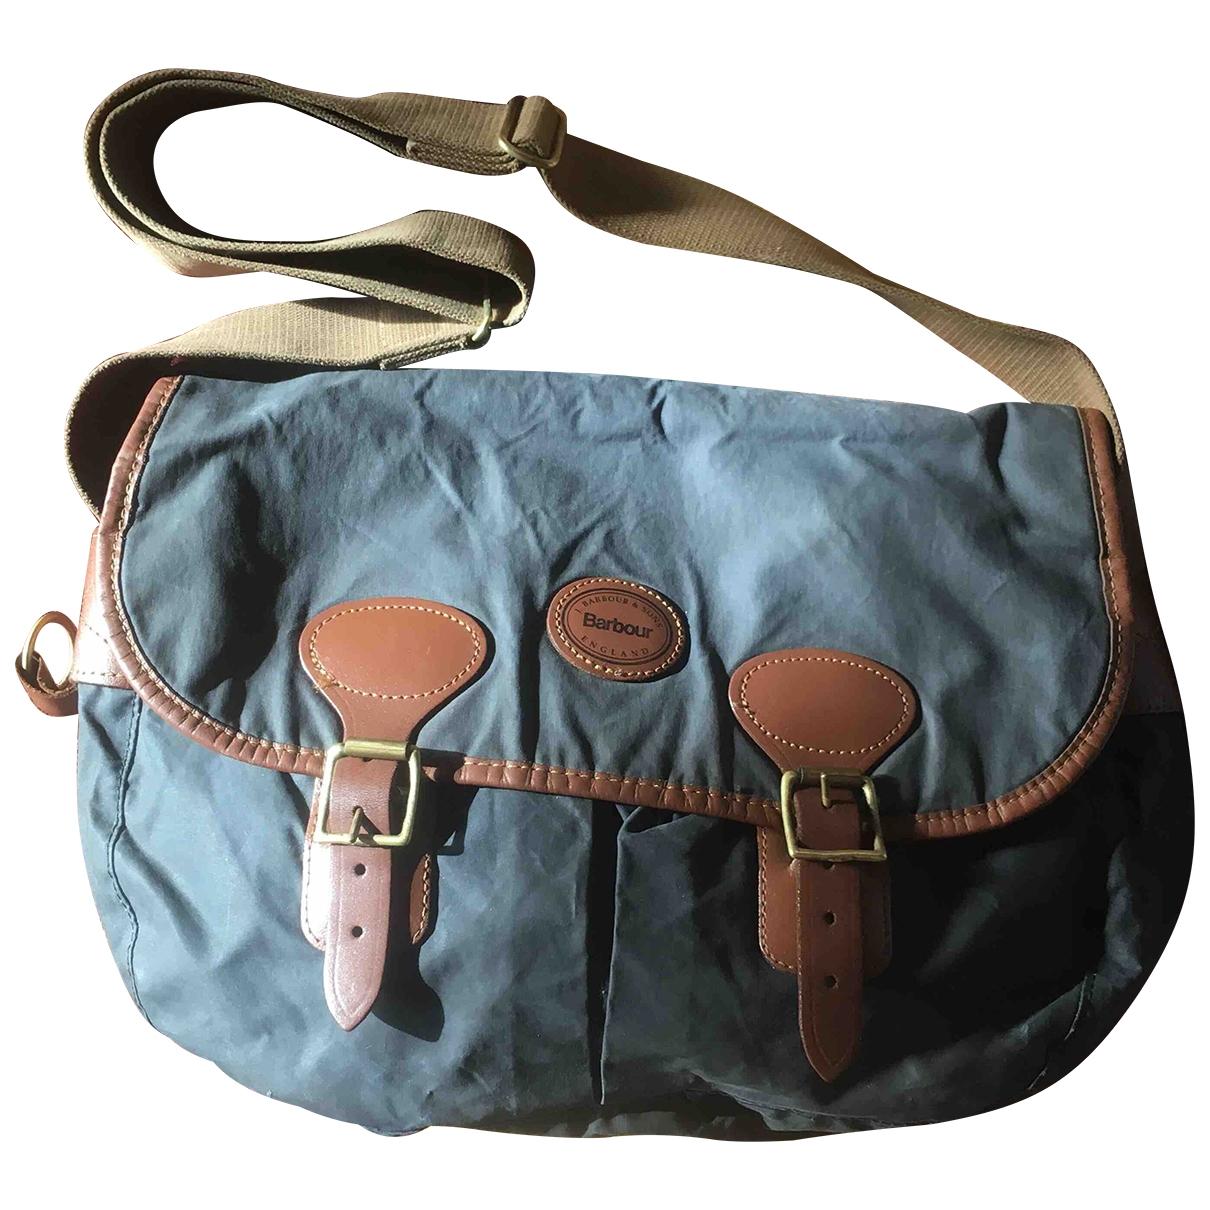 Barbour \N Handtasche in  Blau Synthetik